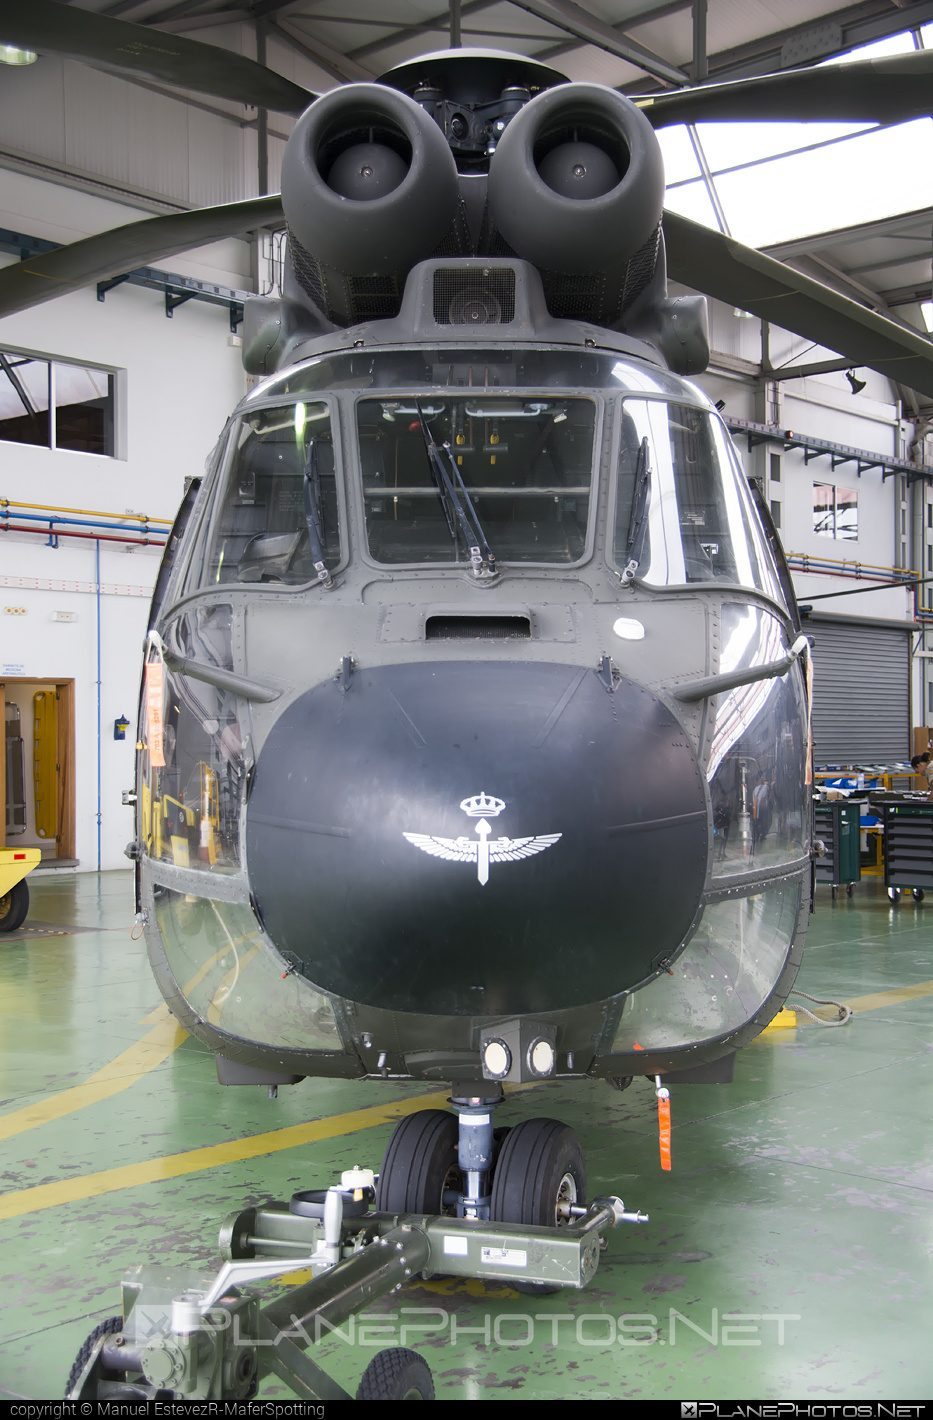 Aerospatiale AS332 B1 Super Puma - HU.21-12 operated by Ejército de Tierra (Spanish Army) #aerospatiale #as332 #as332b1 #superpuma